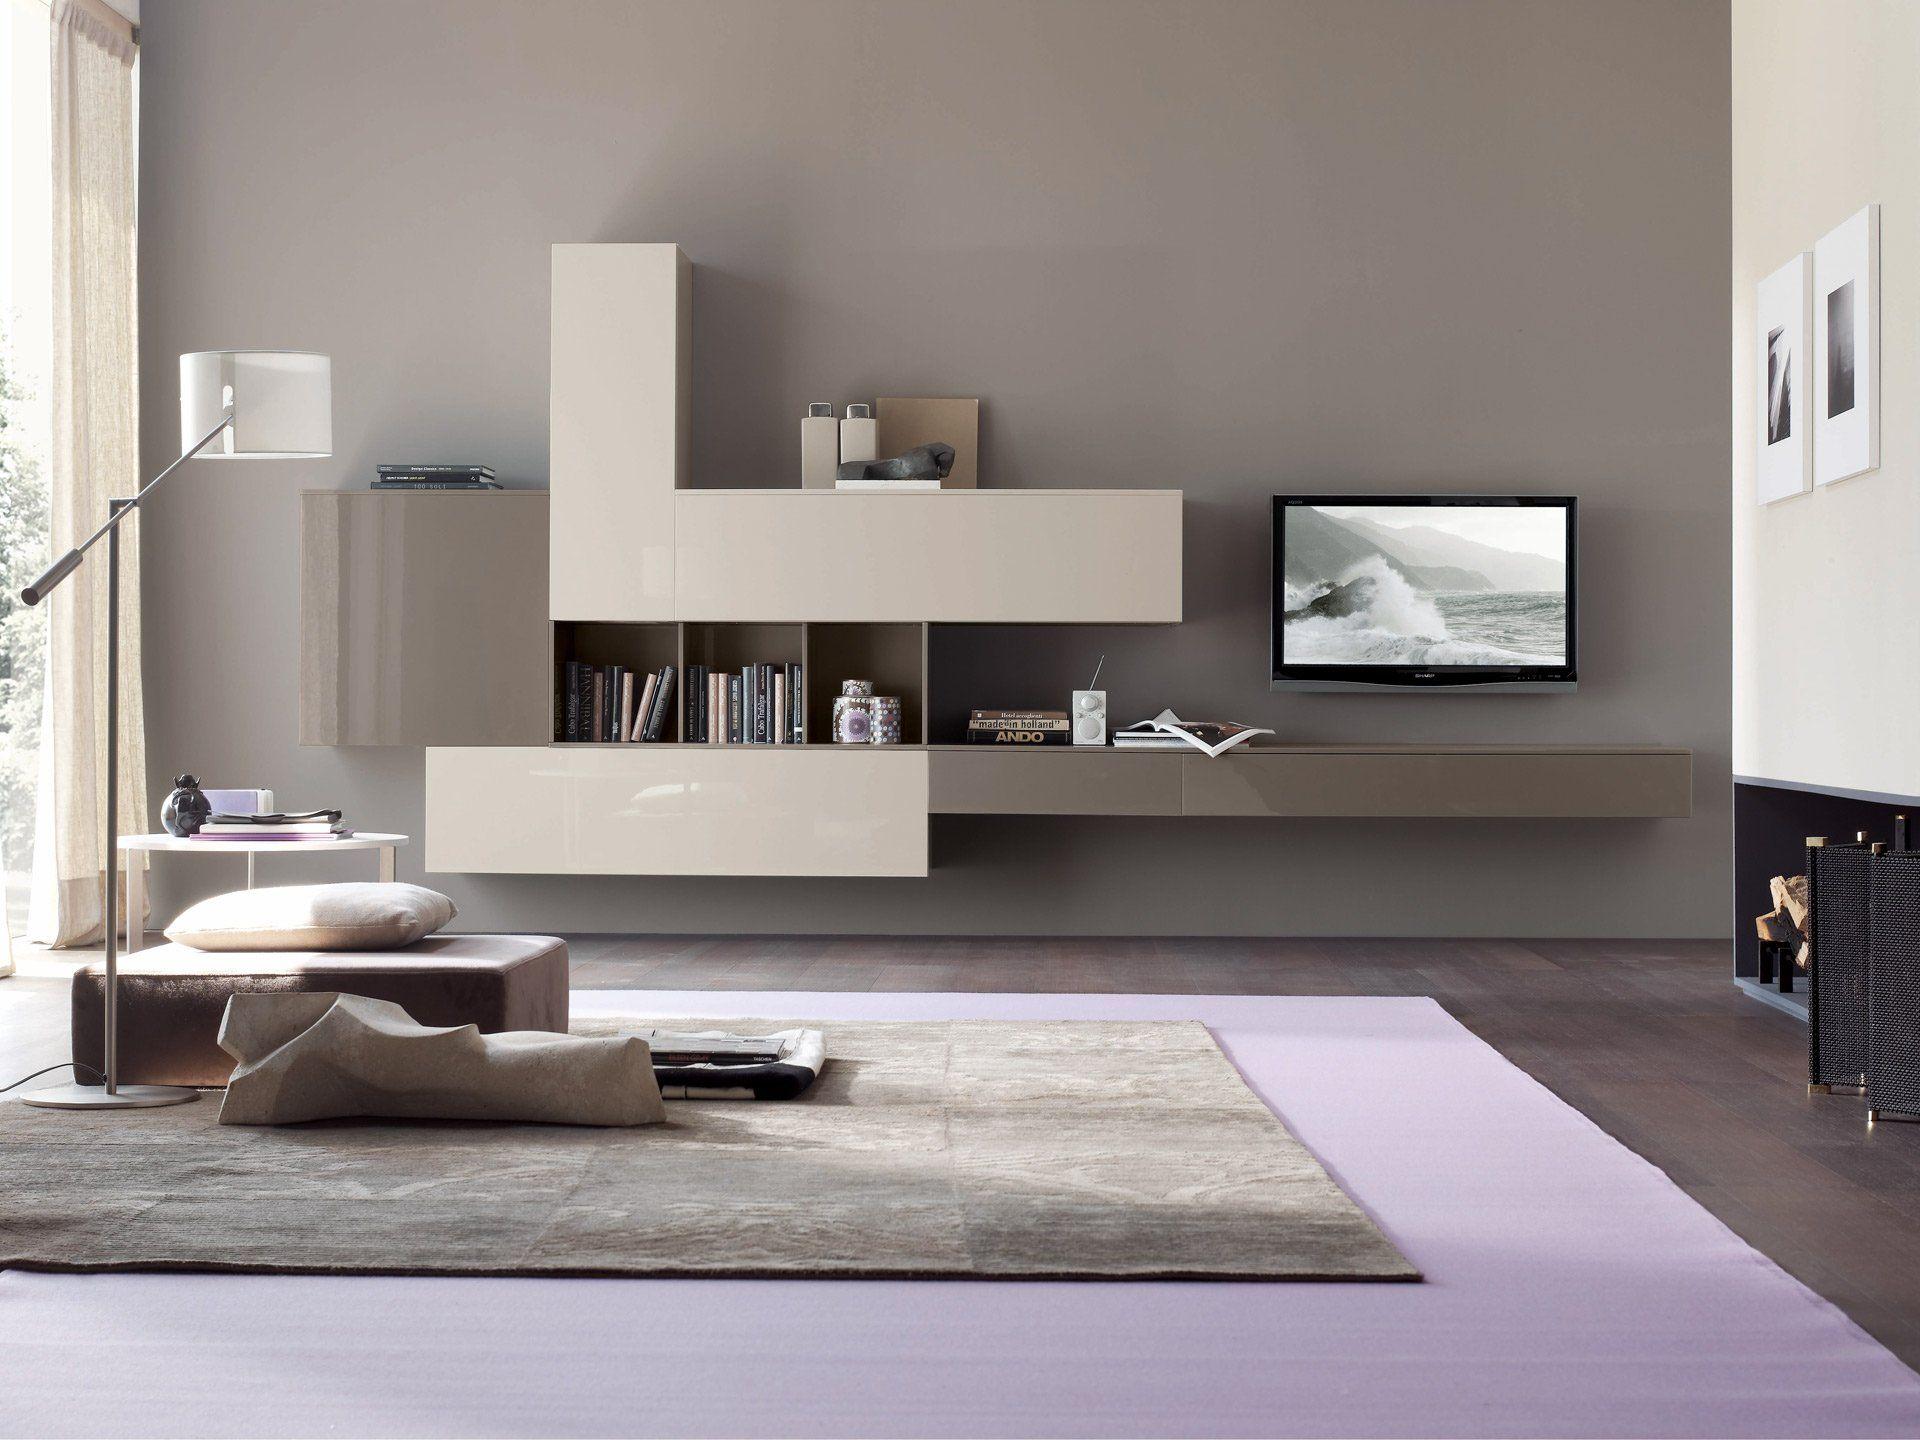 Armadi ikea neri - Ikea torino catalogo ...